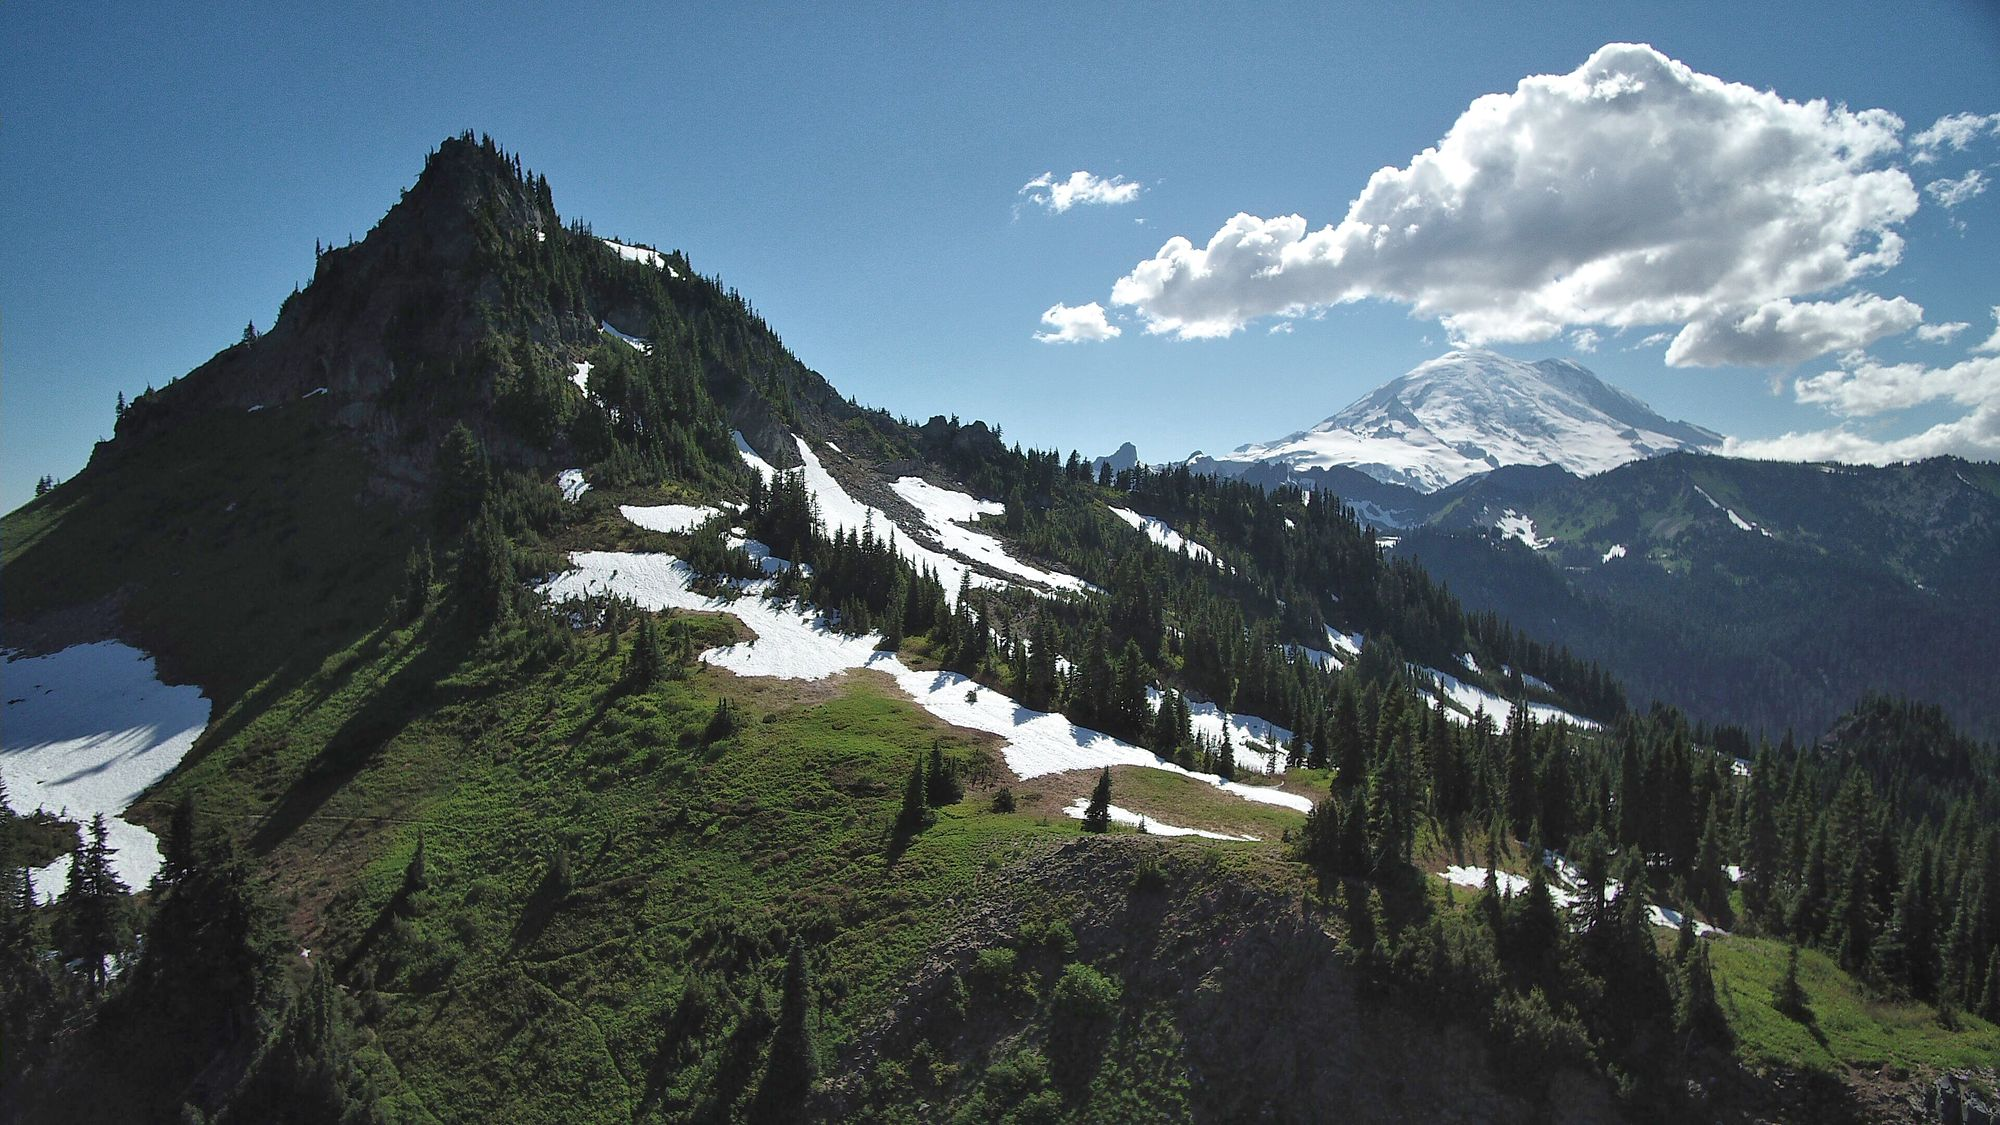 Qui ne se sentirait pas attiré par ces montagnes •Who would not feel attracted to these mountains. Photo by Ken Theimer on Unsplash